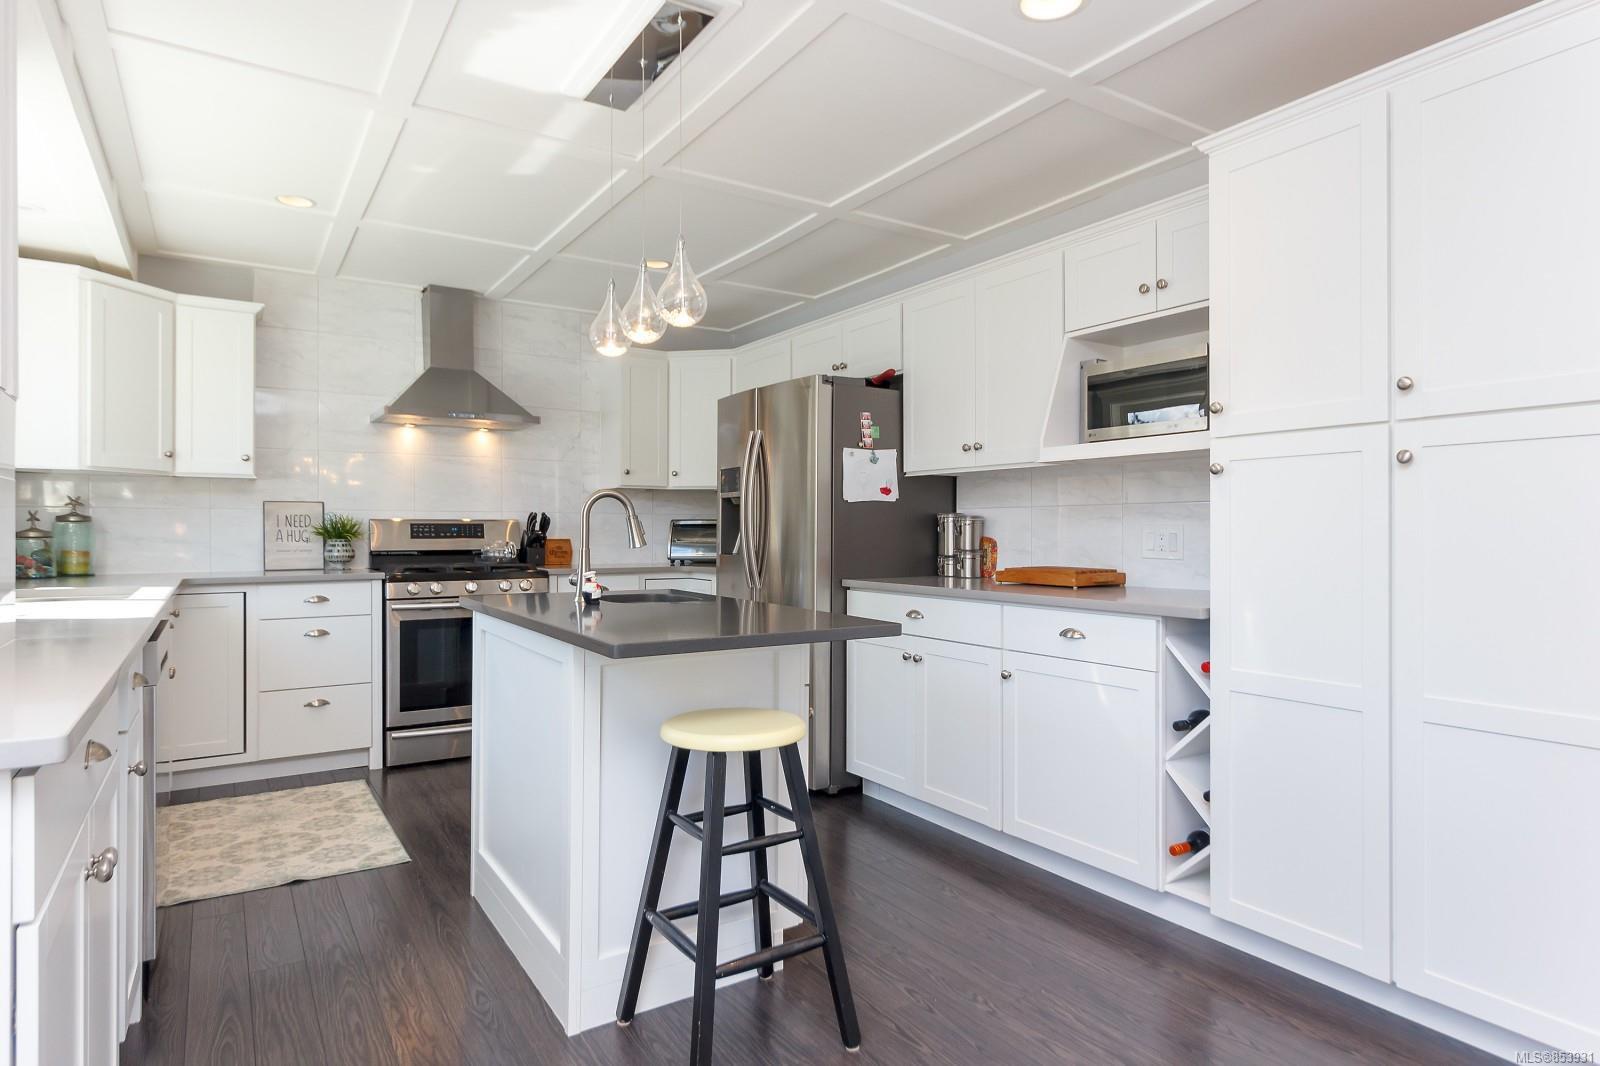 Photo 7: Photos: 2456 Timbercrest Dr in : Du East Duncan House for sale (Duncan)  : MLS®# 853931